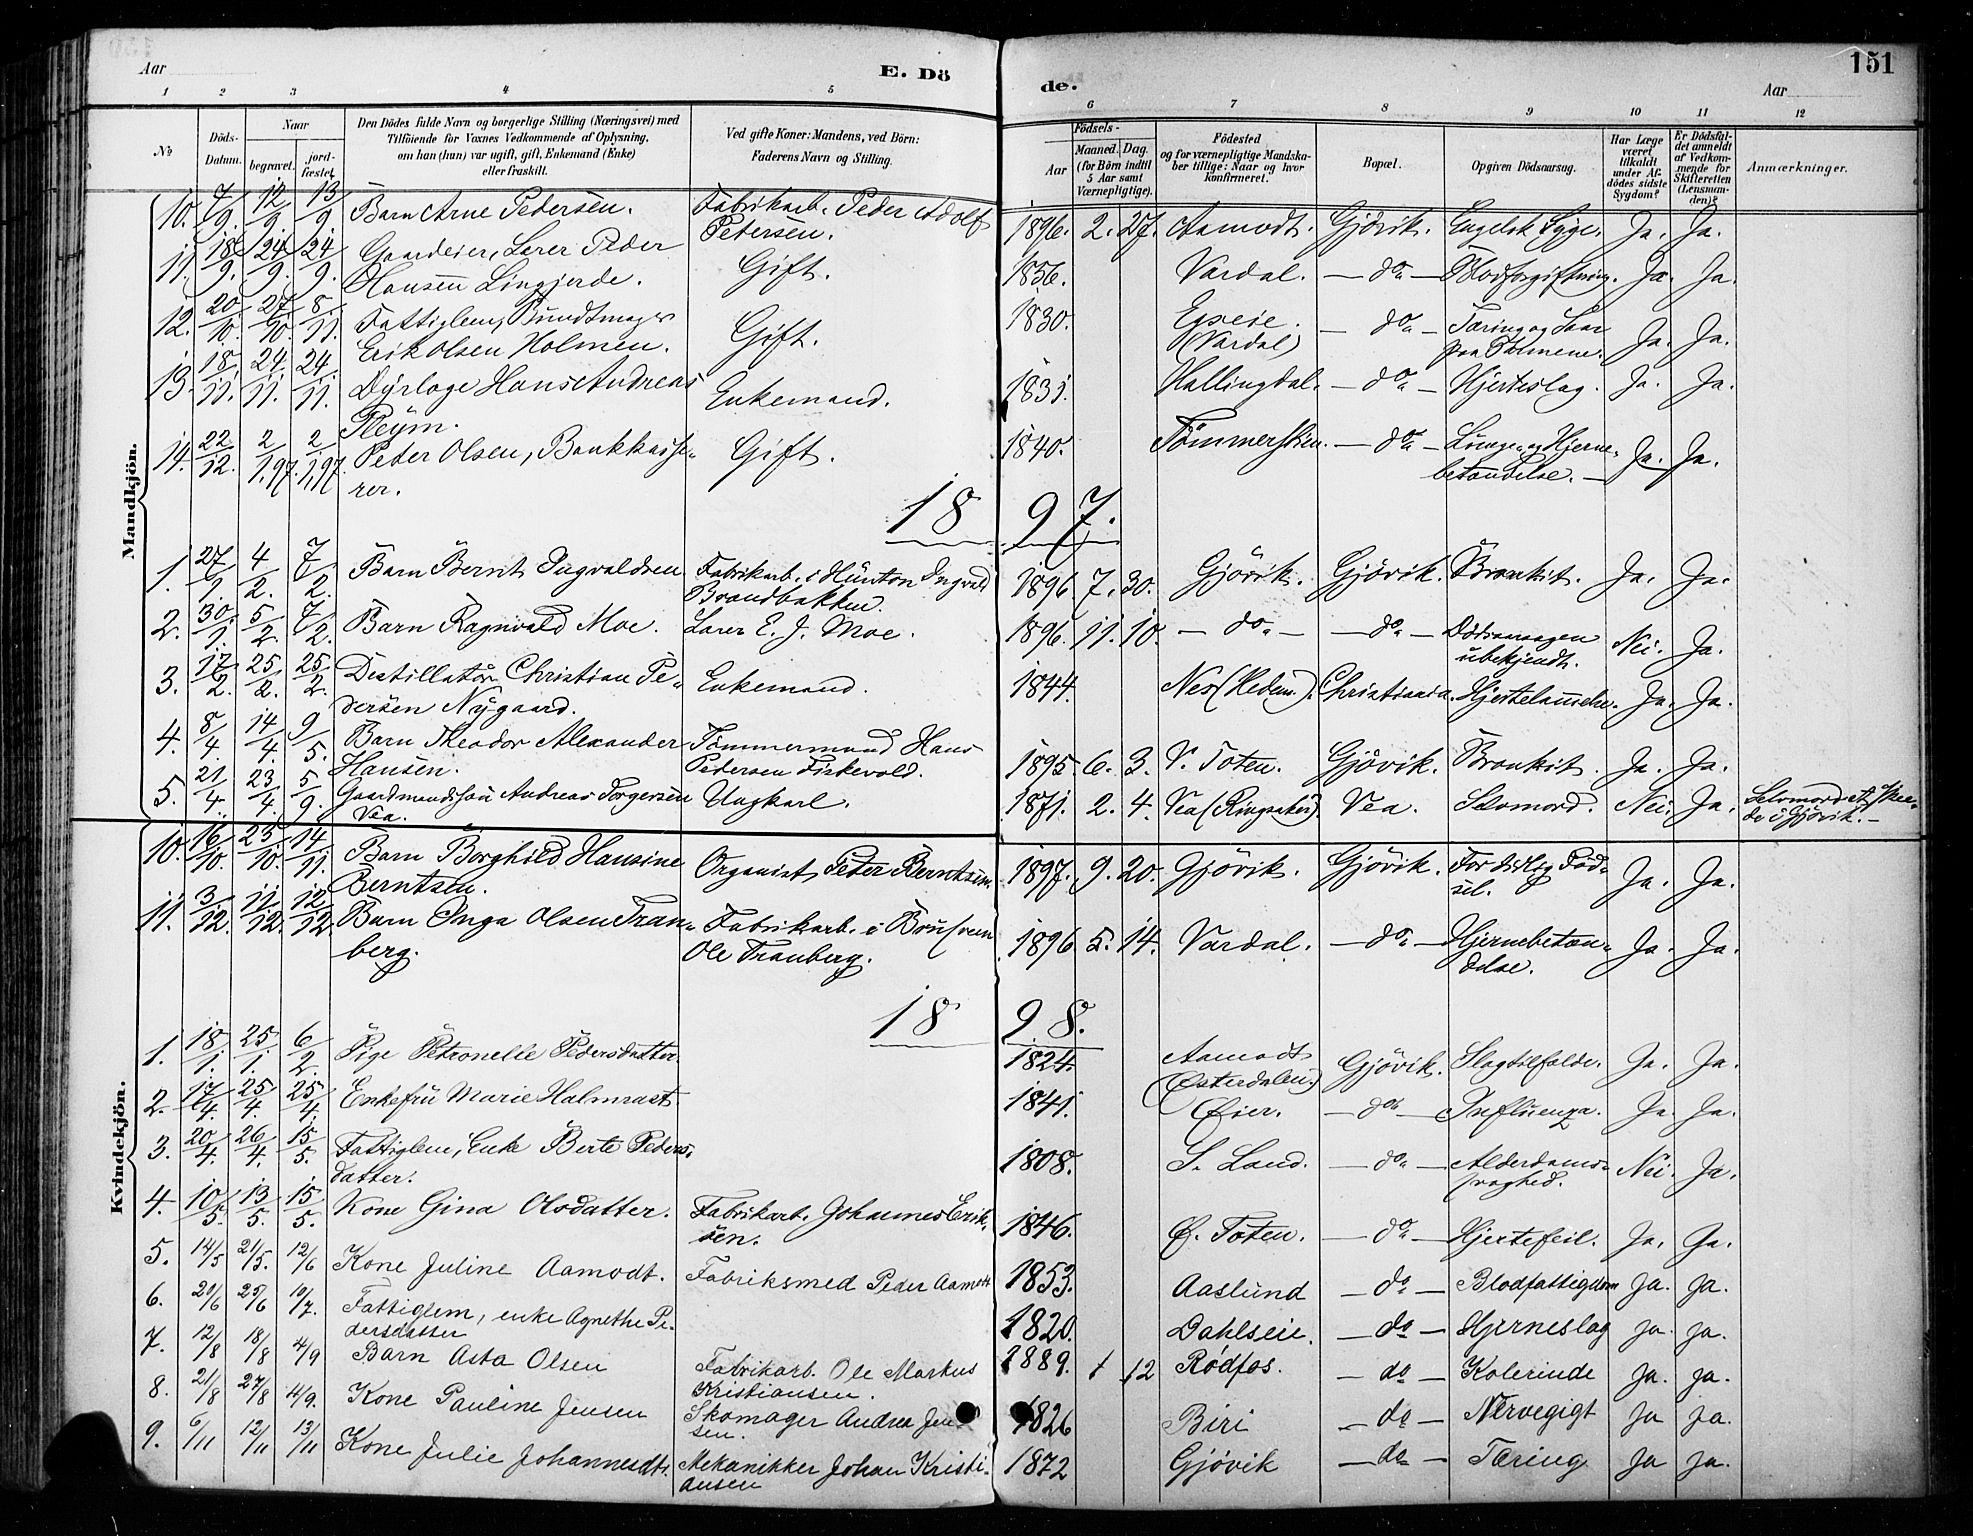 SAH, Vardal prestekontor, H/Ha/Haa/L0011: Ministerialbok nr. 11, 1891-1901, s. 151